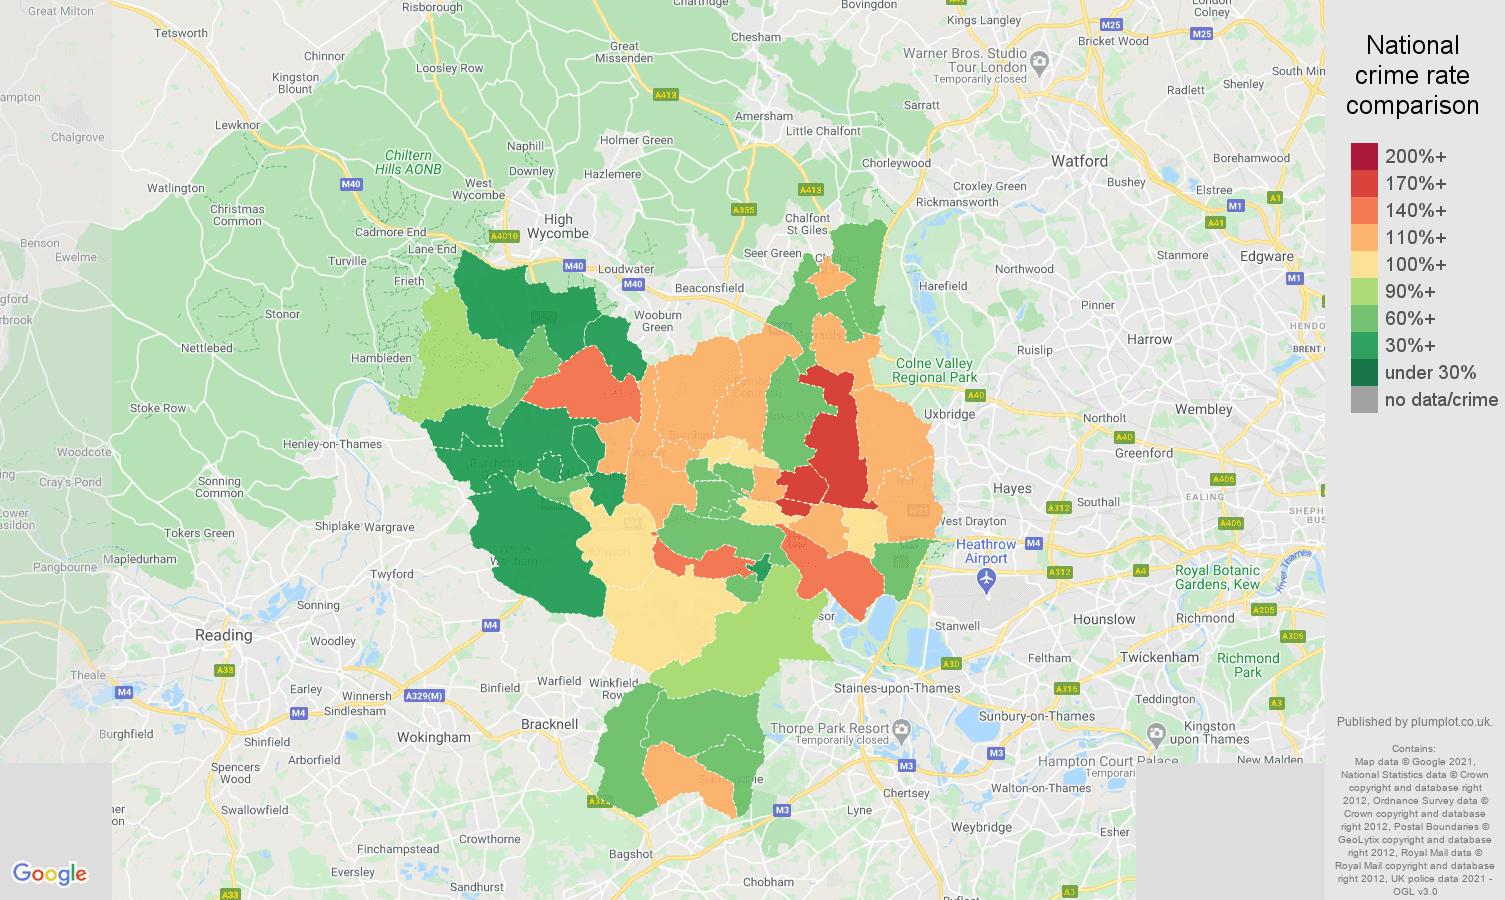 Slough burglary crime rate comparison map